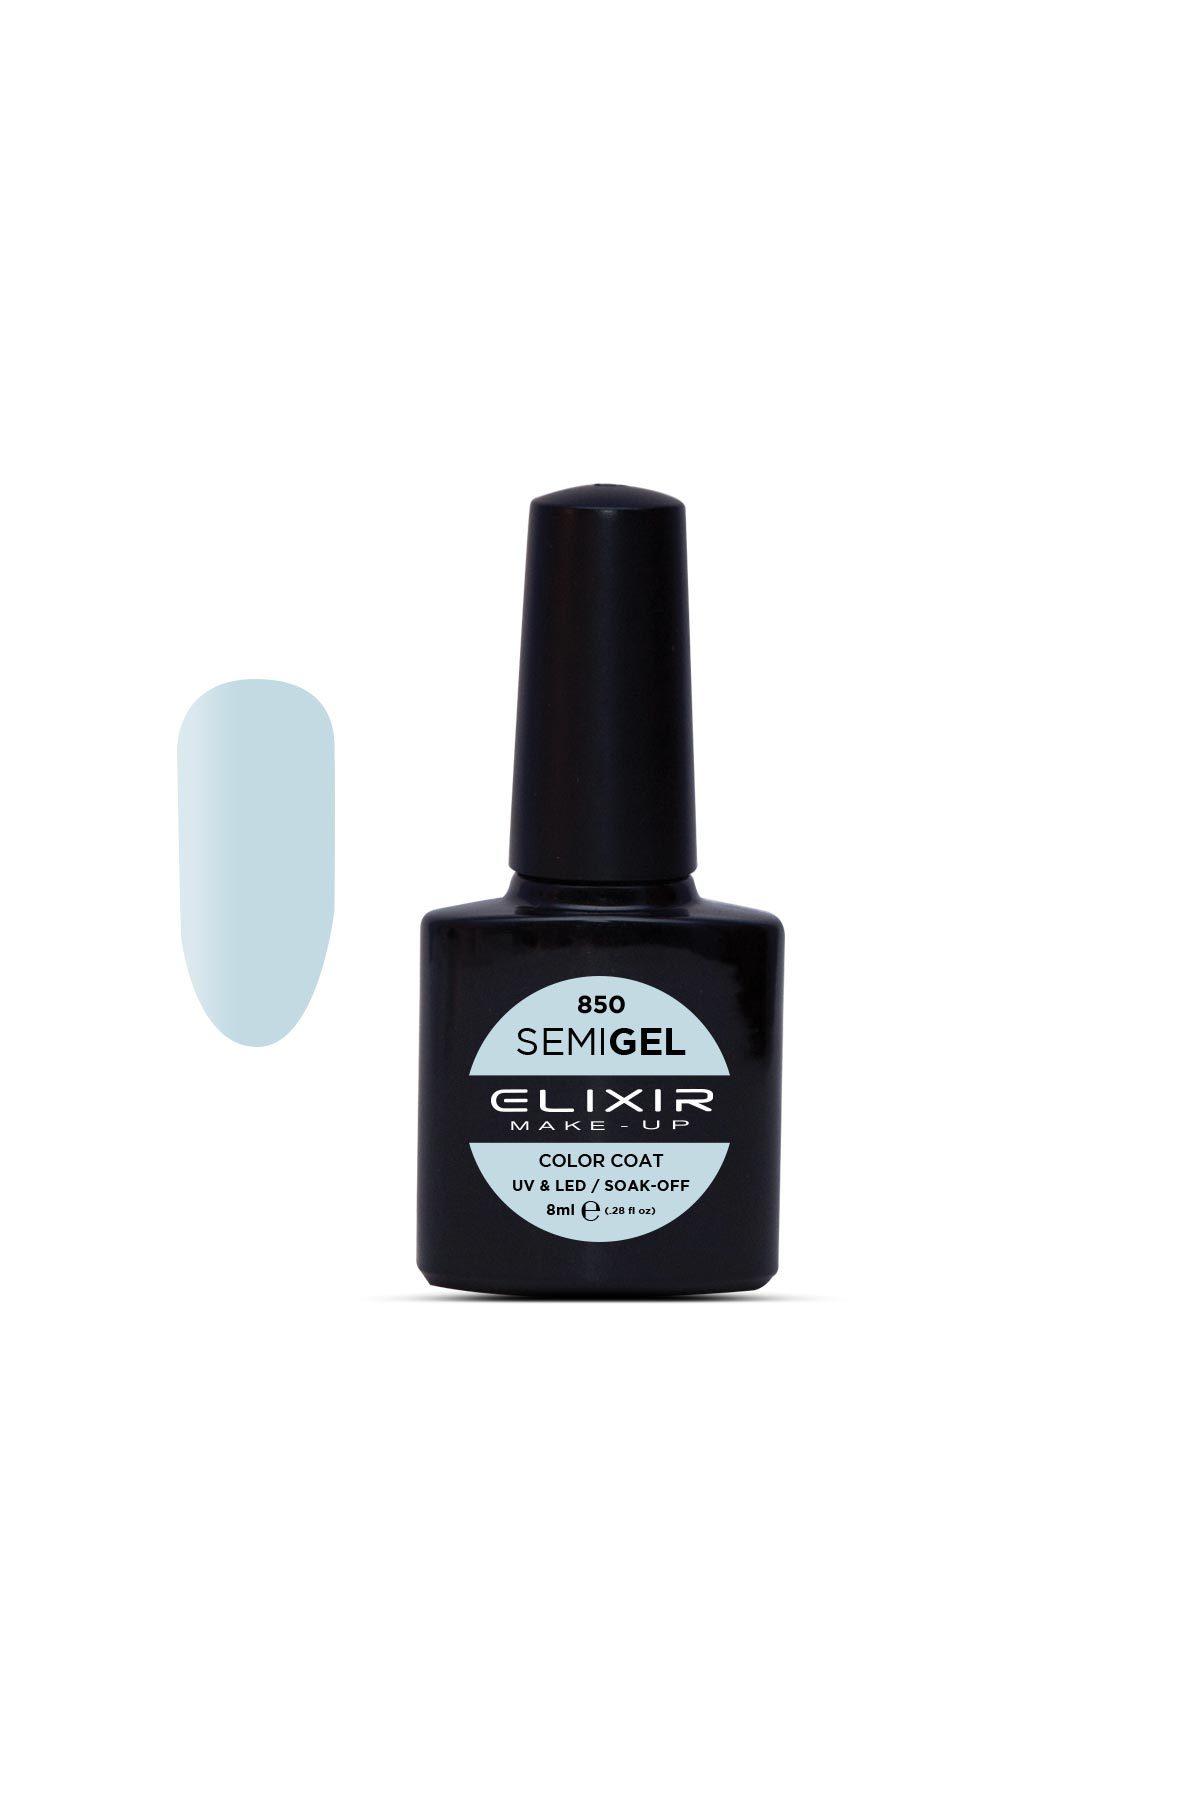 Elixir Make-up Semigel Ημιμόνιμο Βερνίκι No850 Bubbles 8ml